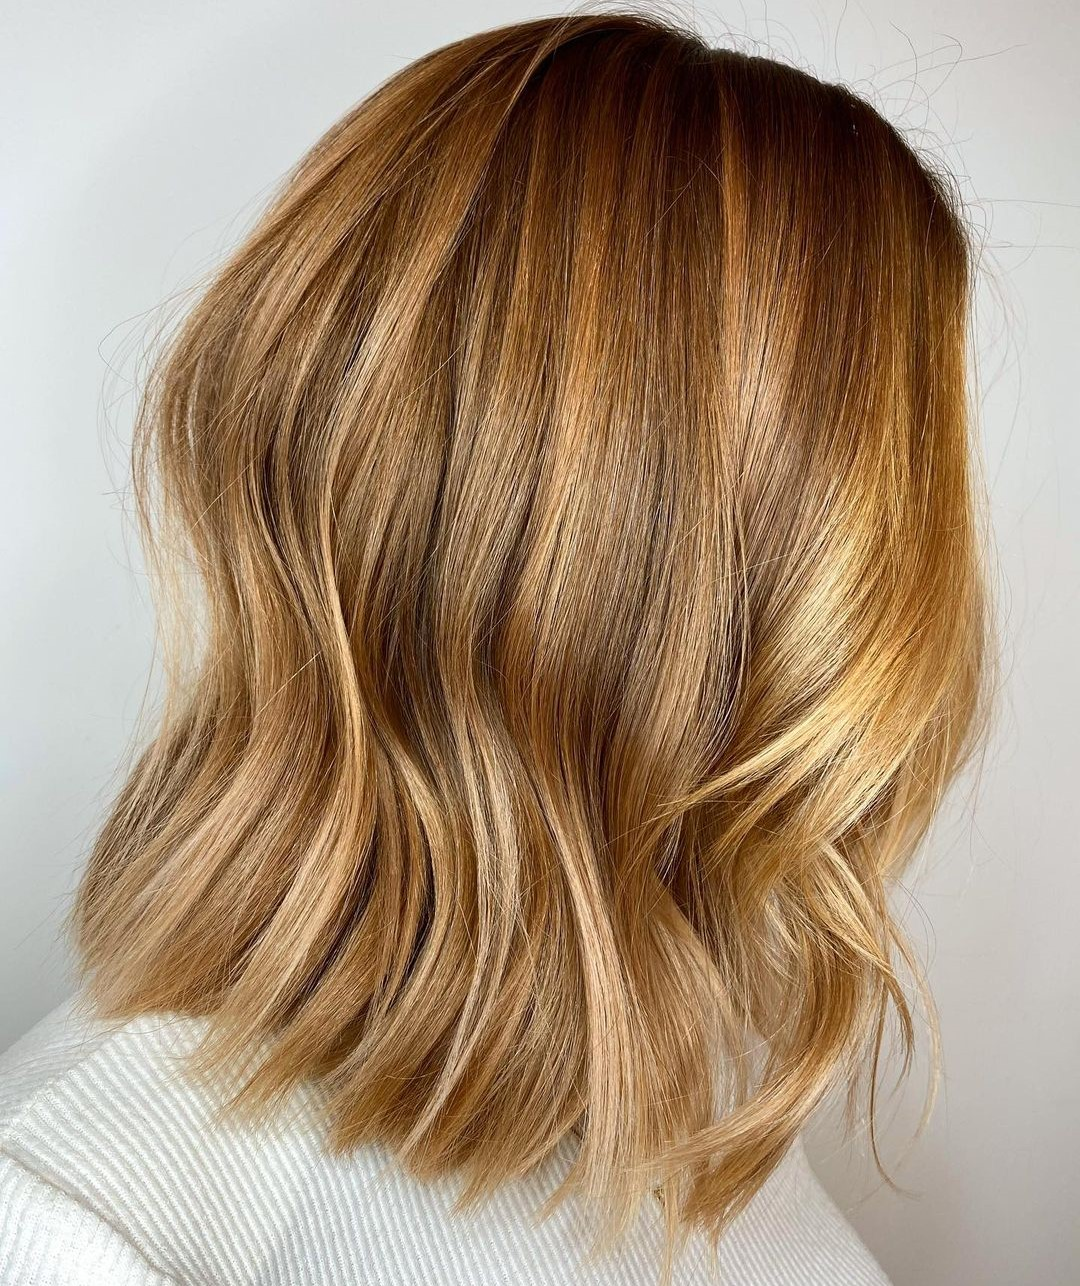 Shoulder-Length Light Golden Brown Cut